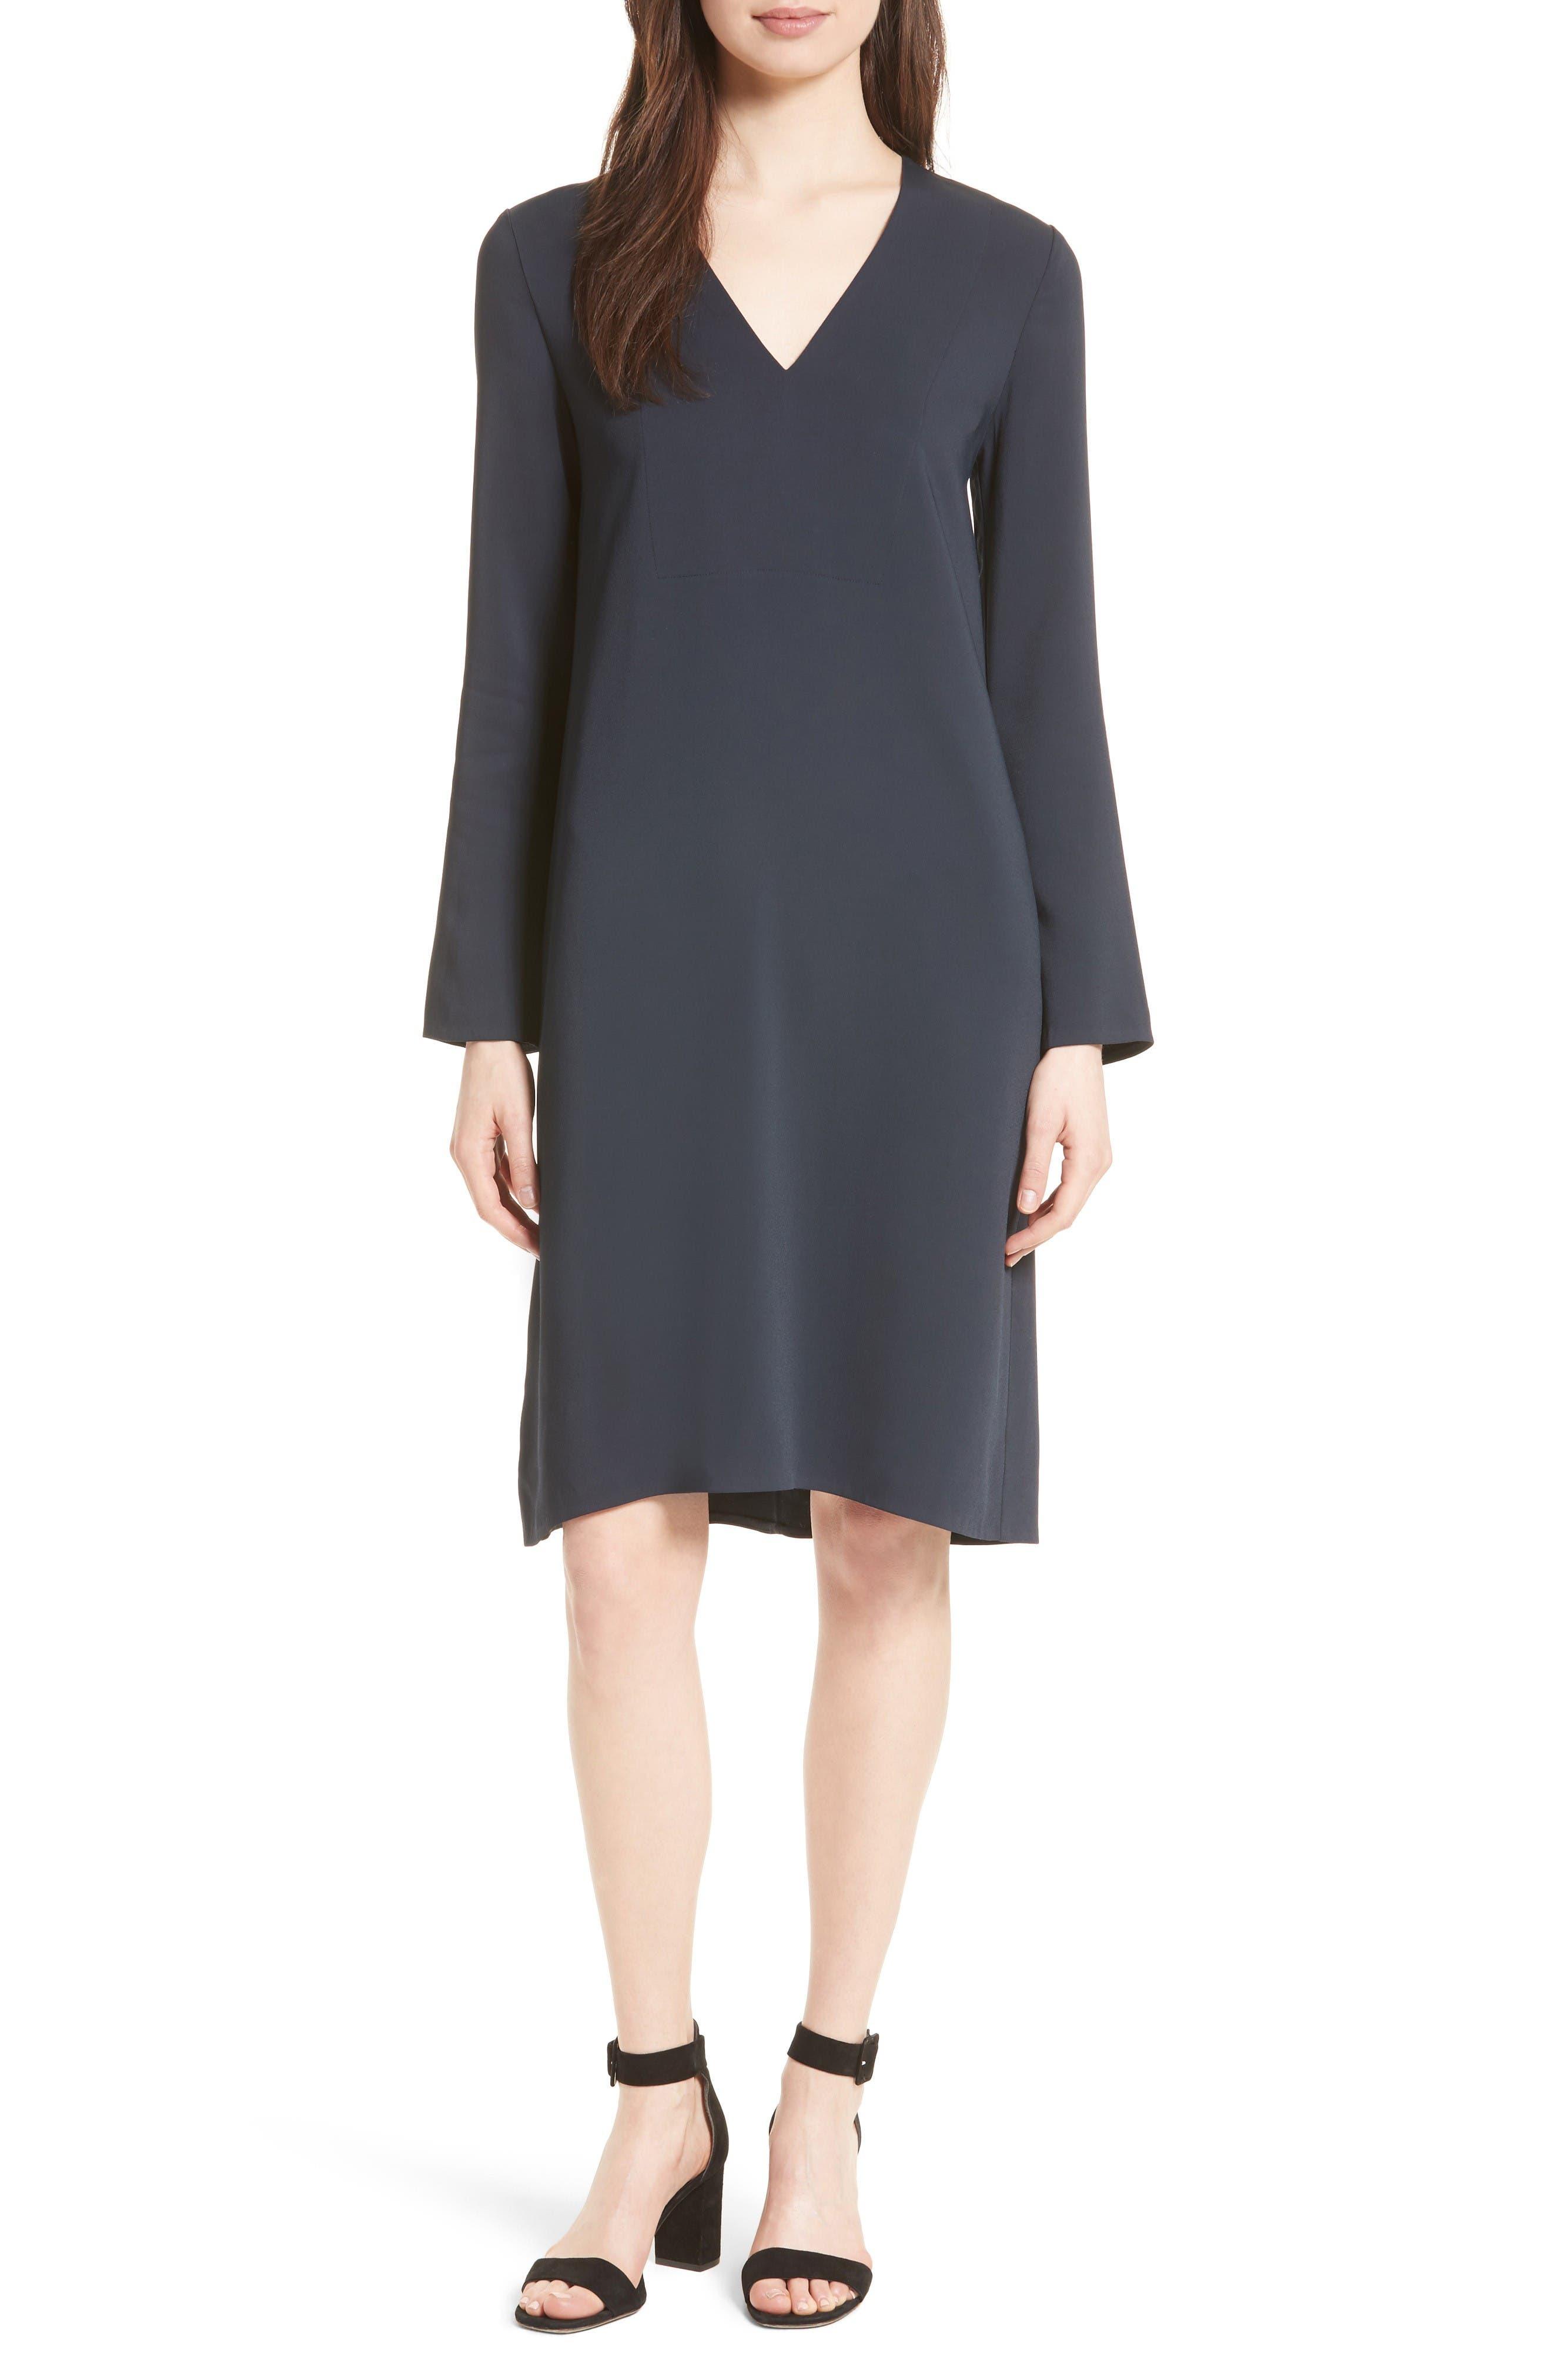 Alternate Image 1 Selected - Vince V-Neck Tunic Dress